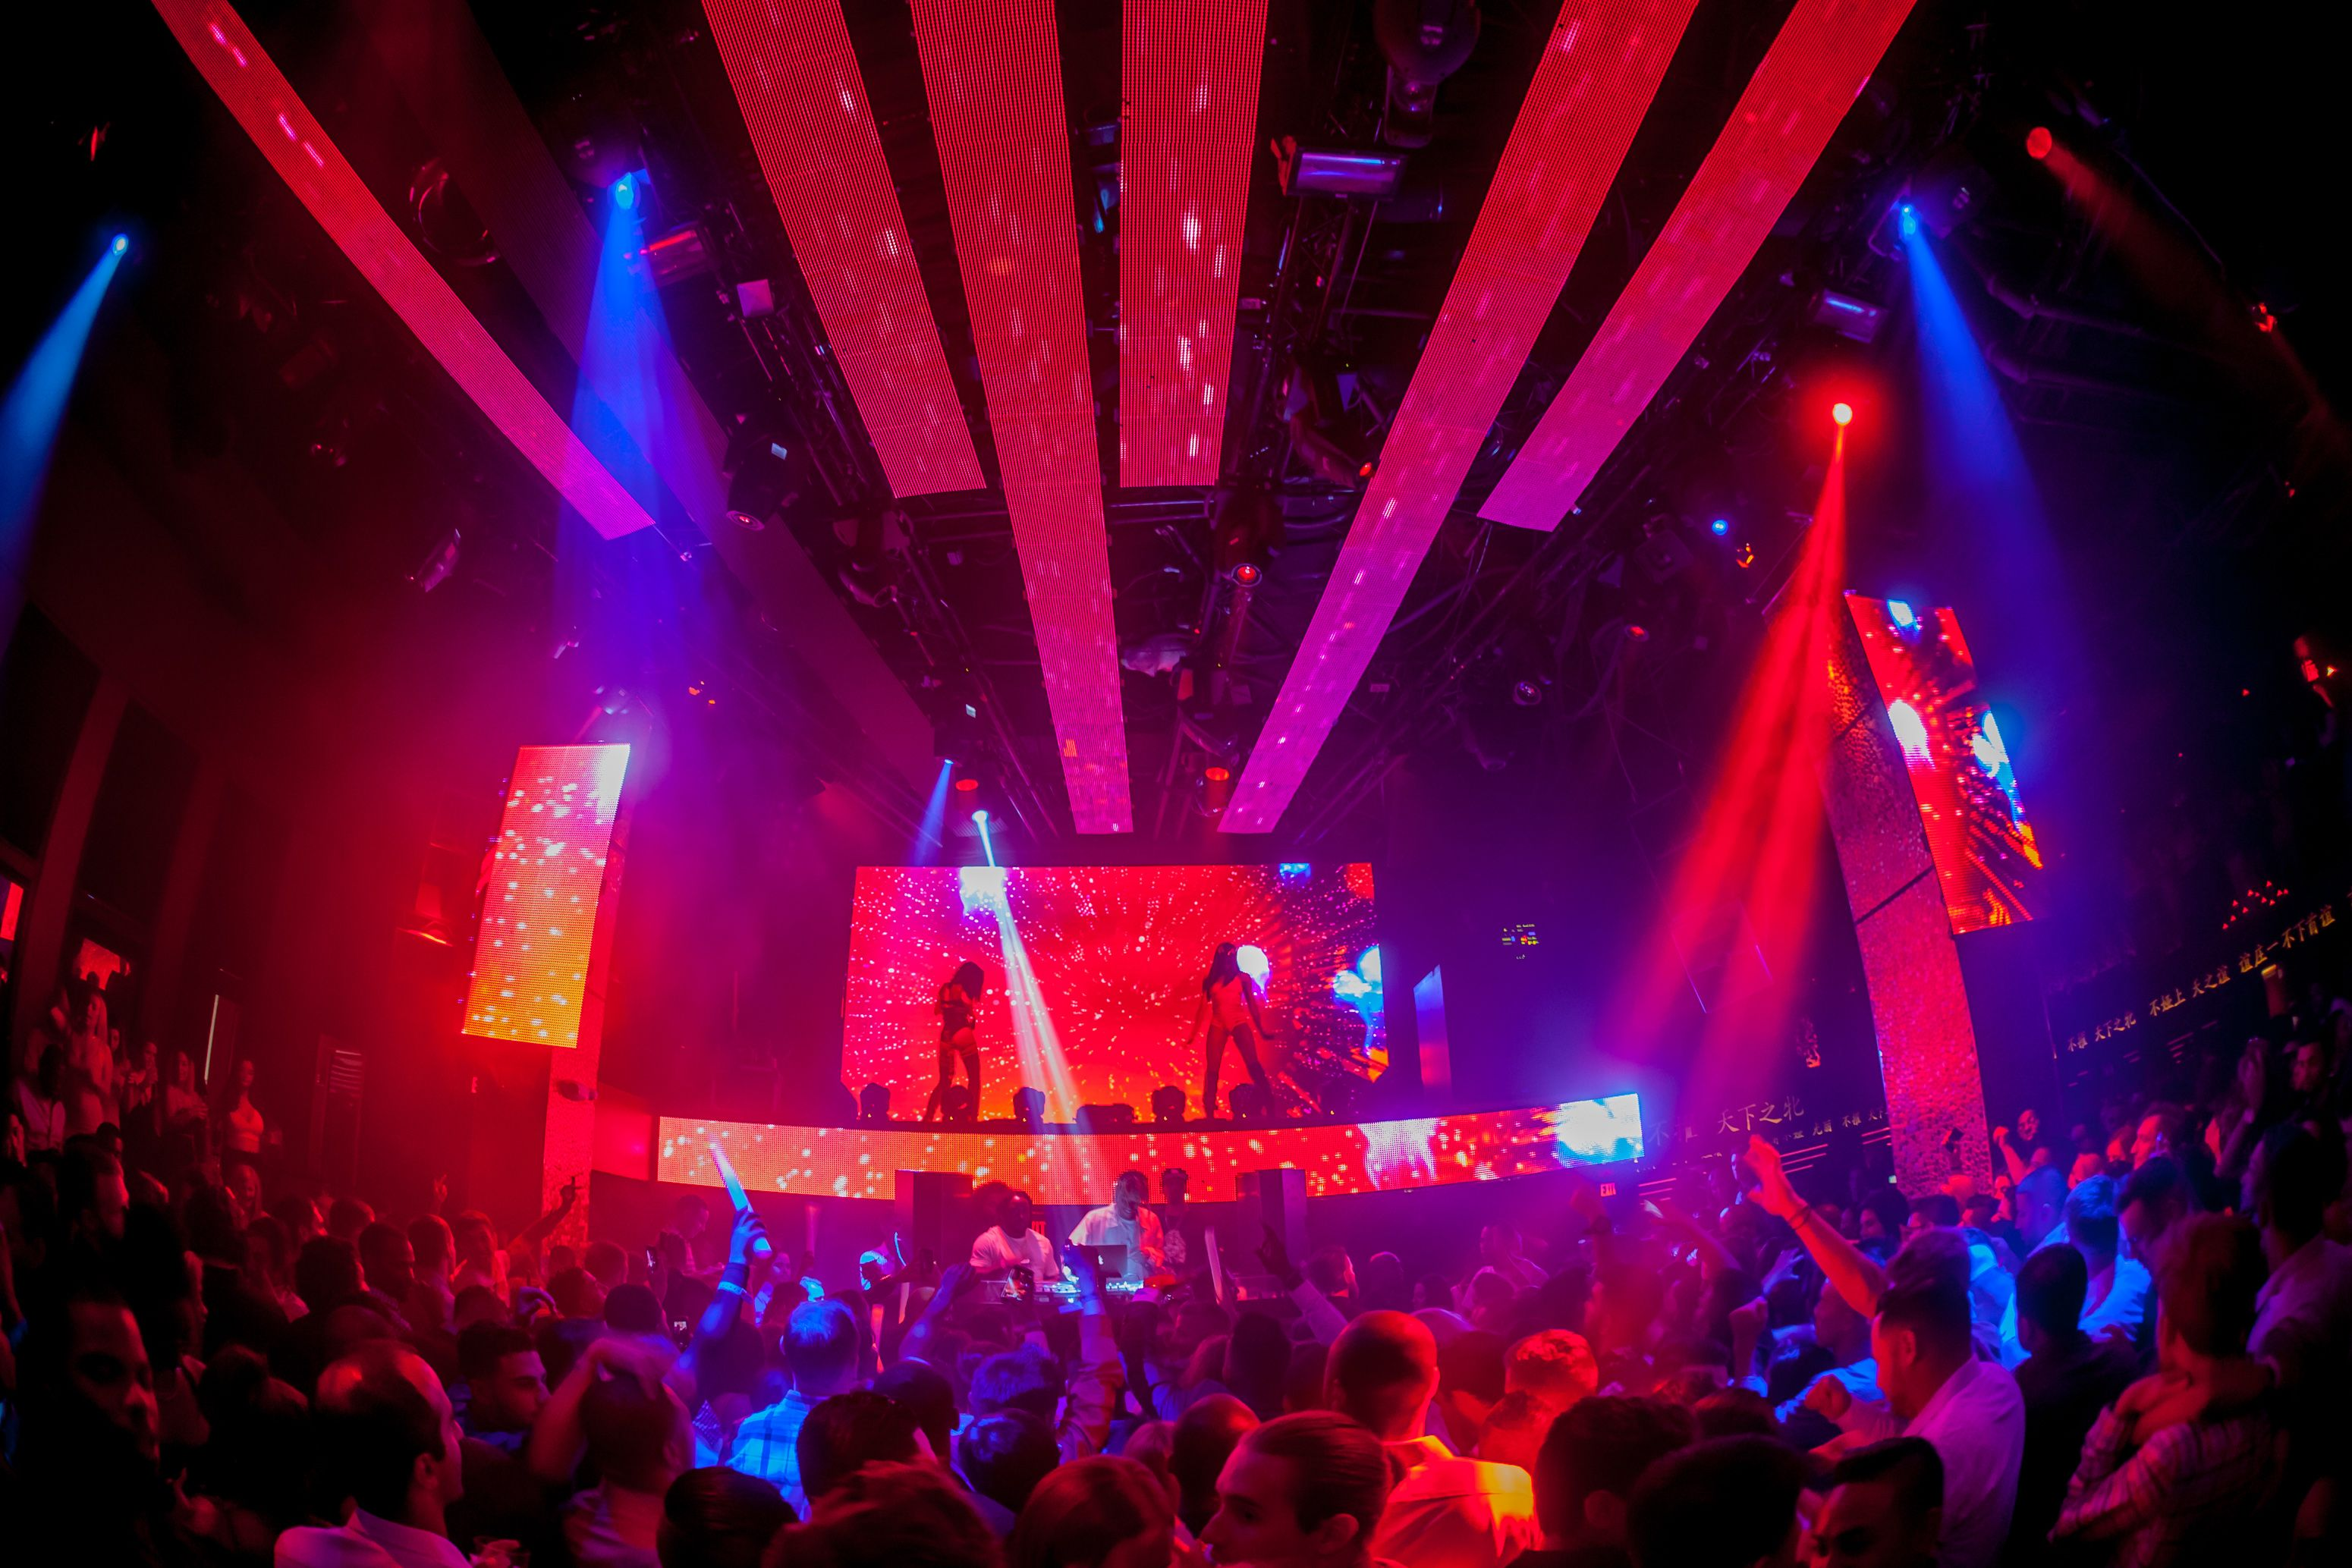 The Best Nightclubs in Las Vegas